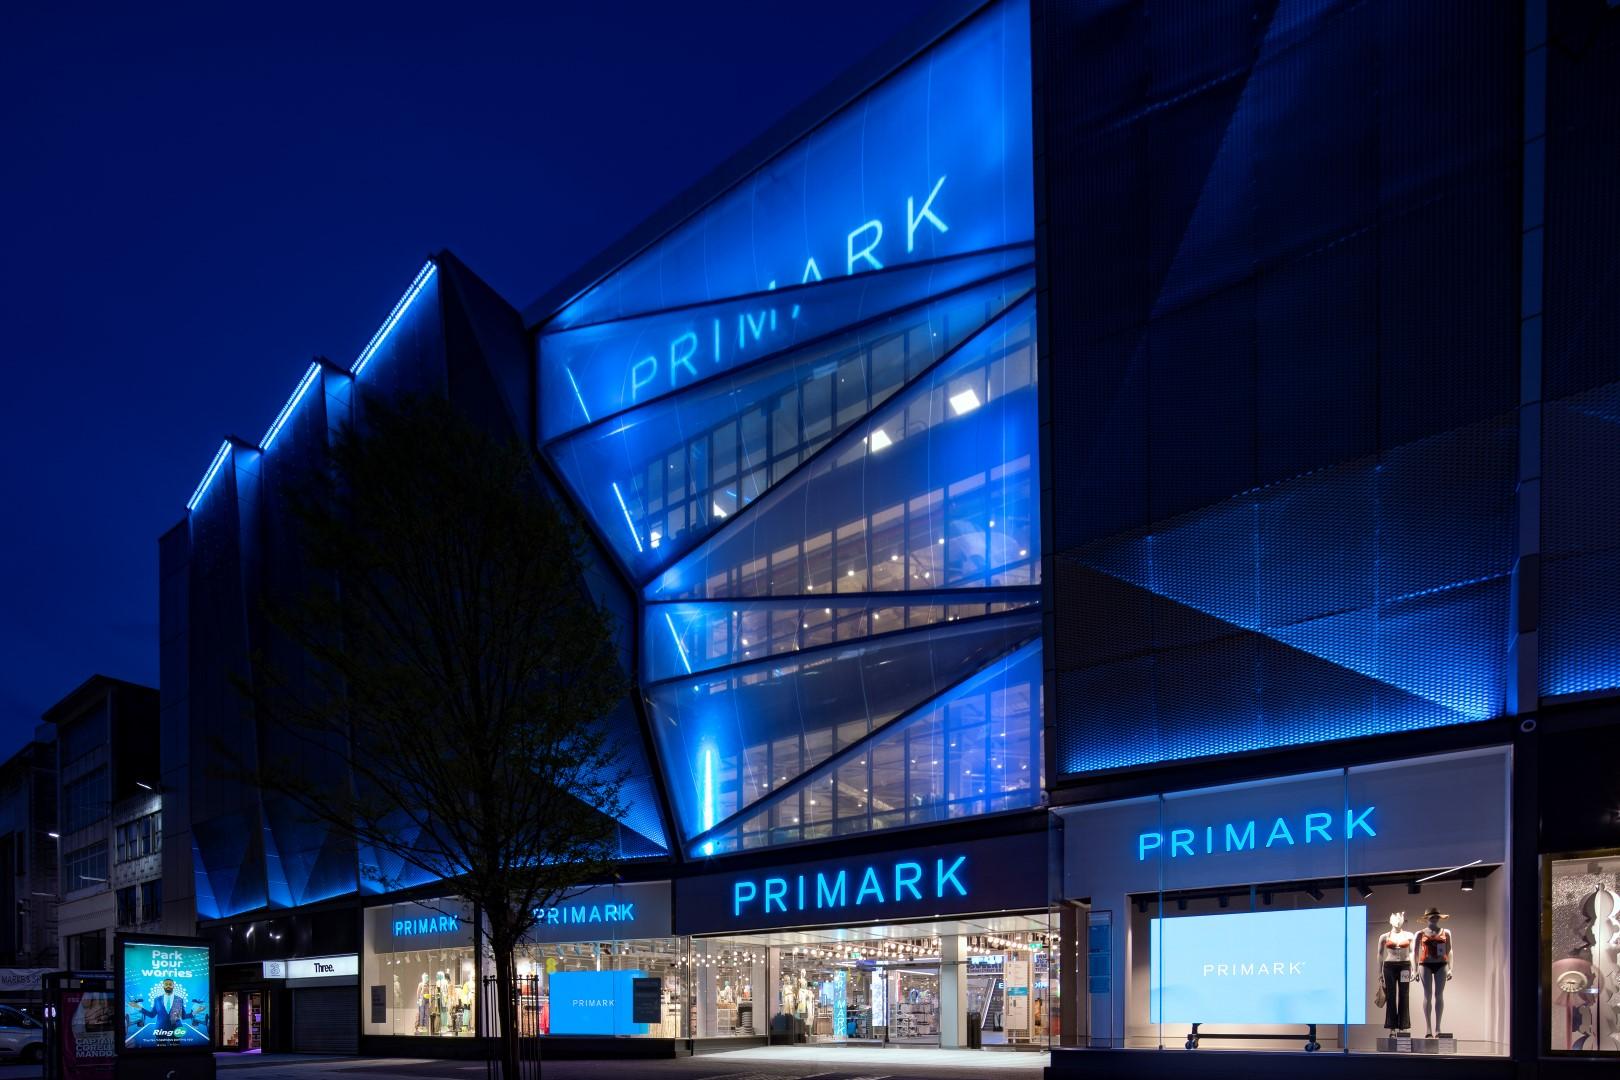 Primark Birmingham High Street